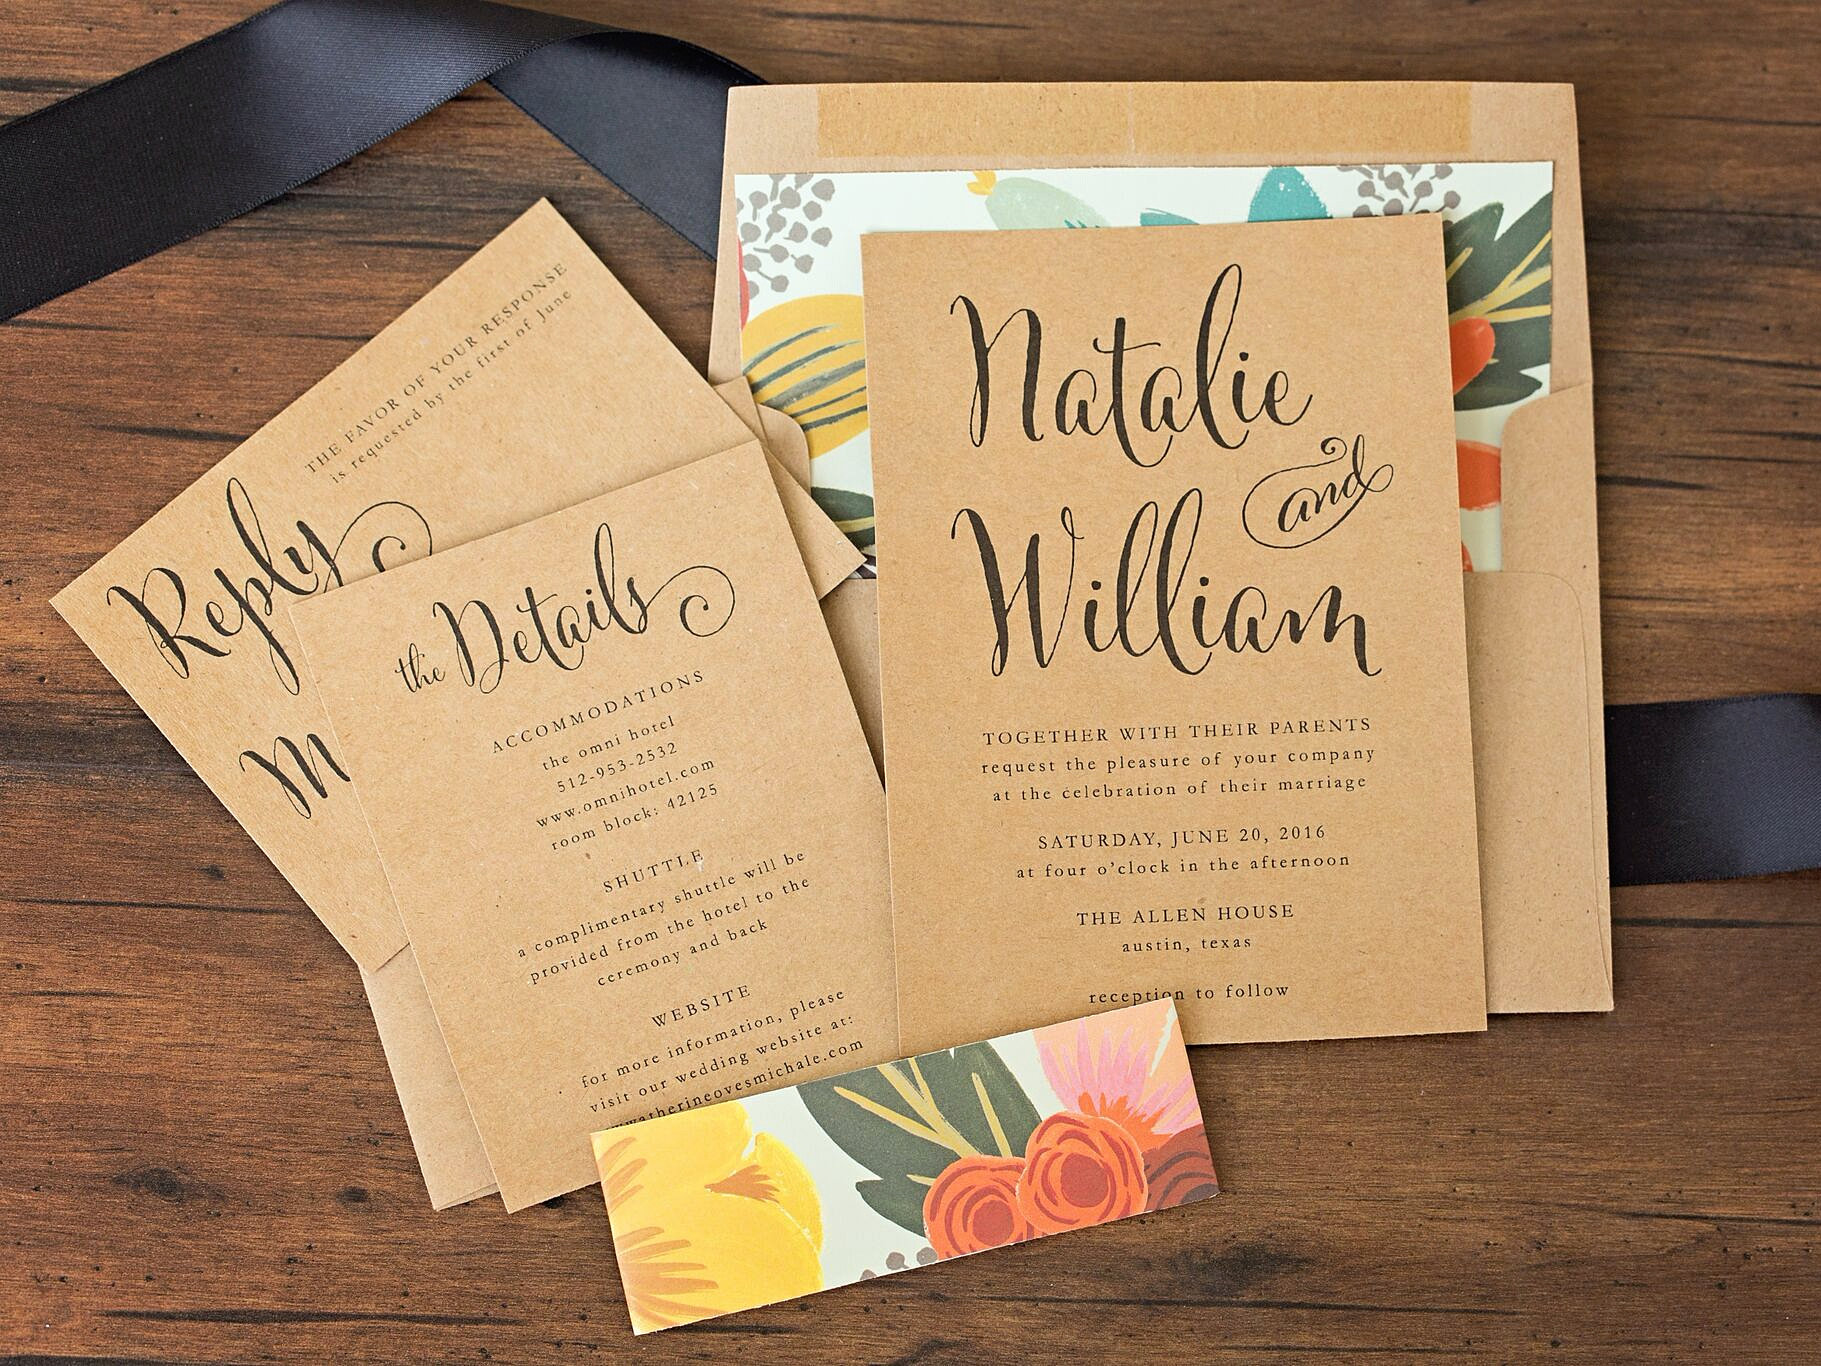 Wedding Invitation Card Paper: Mint & Floral Wedding Invitation